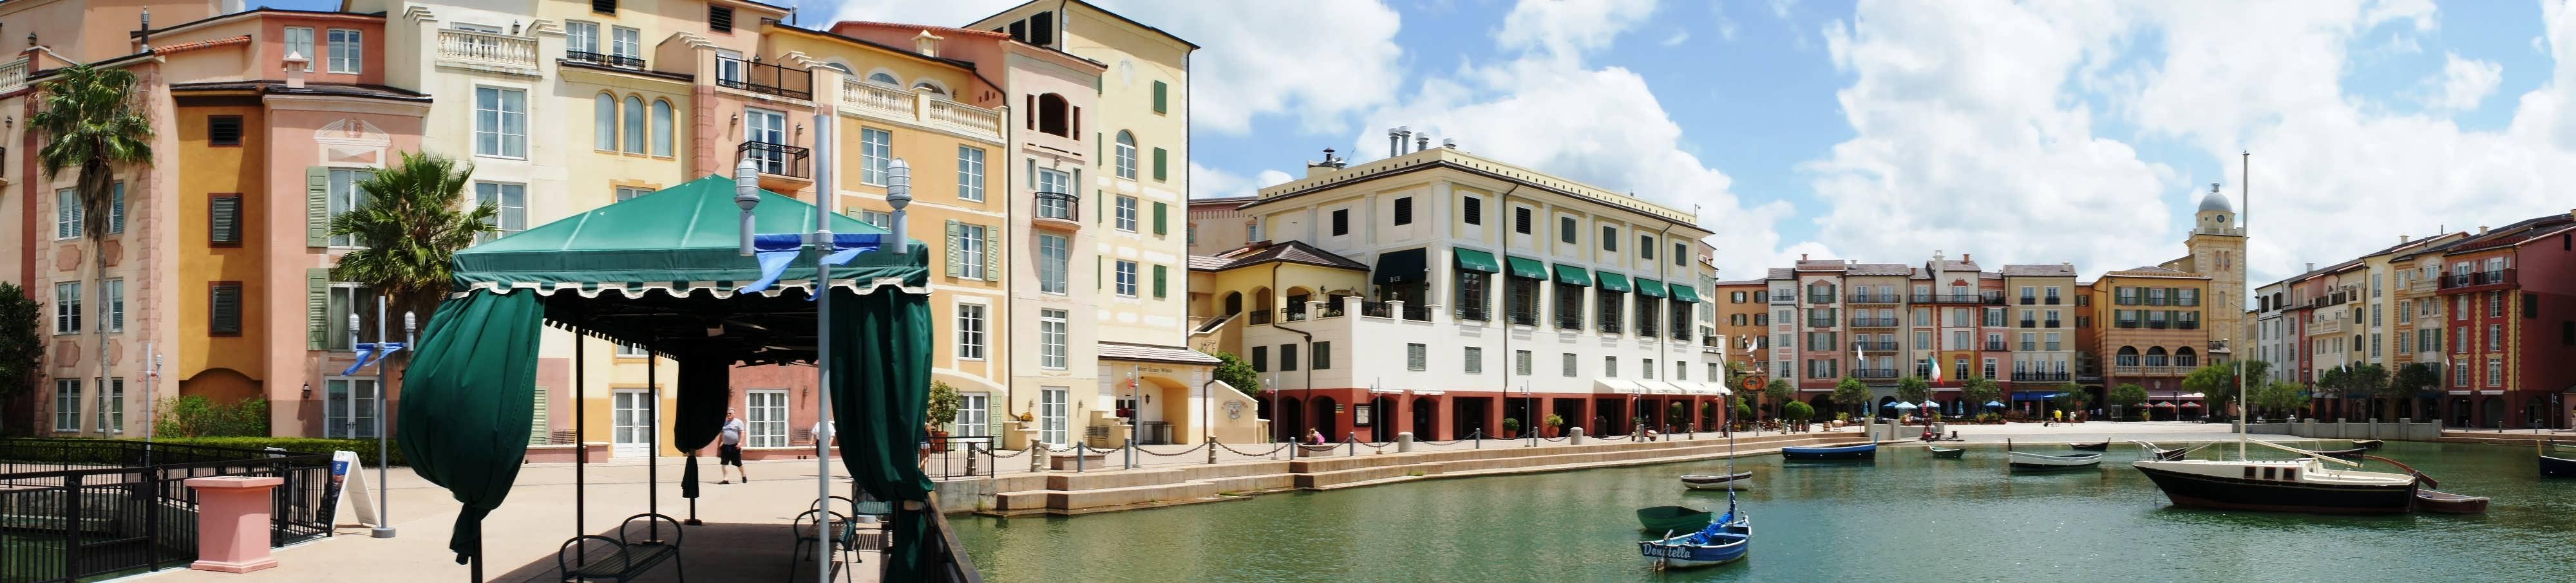 Portofino Bay Hotel Harbor Piazza panorama